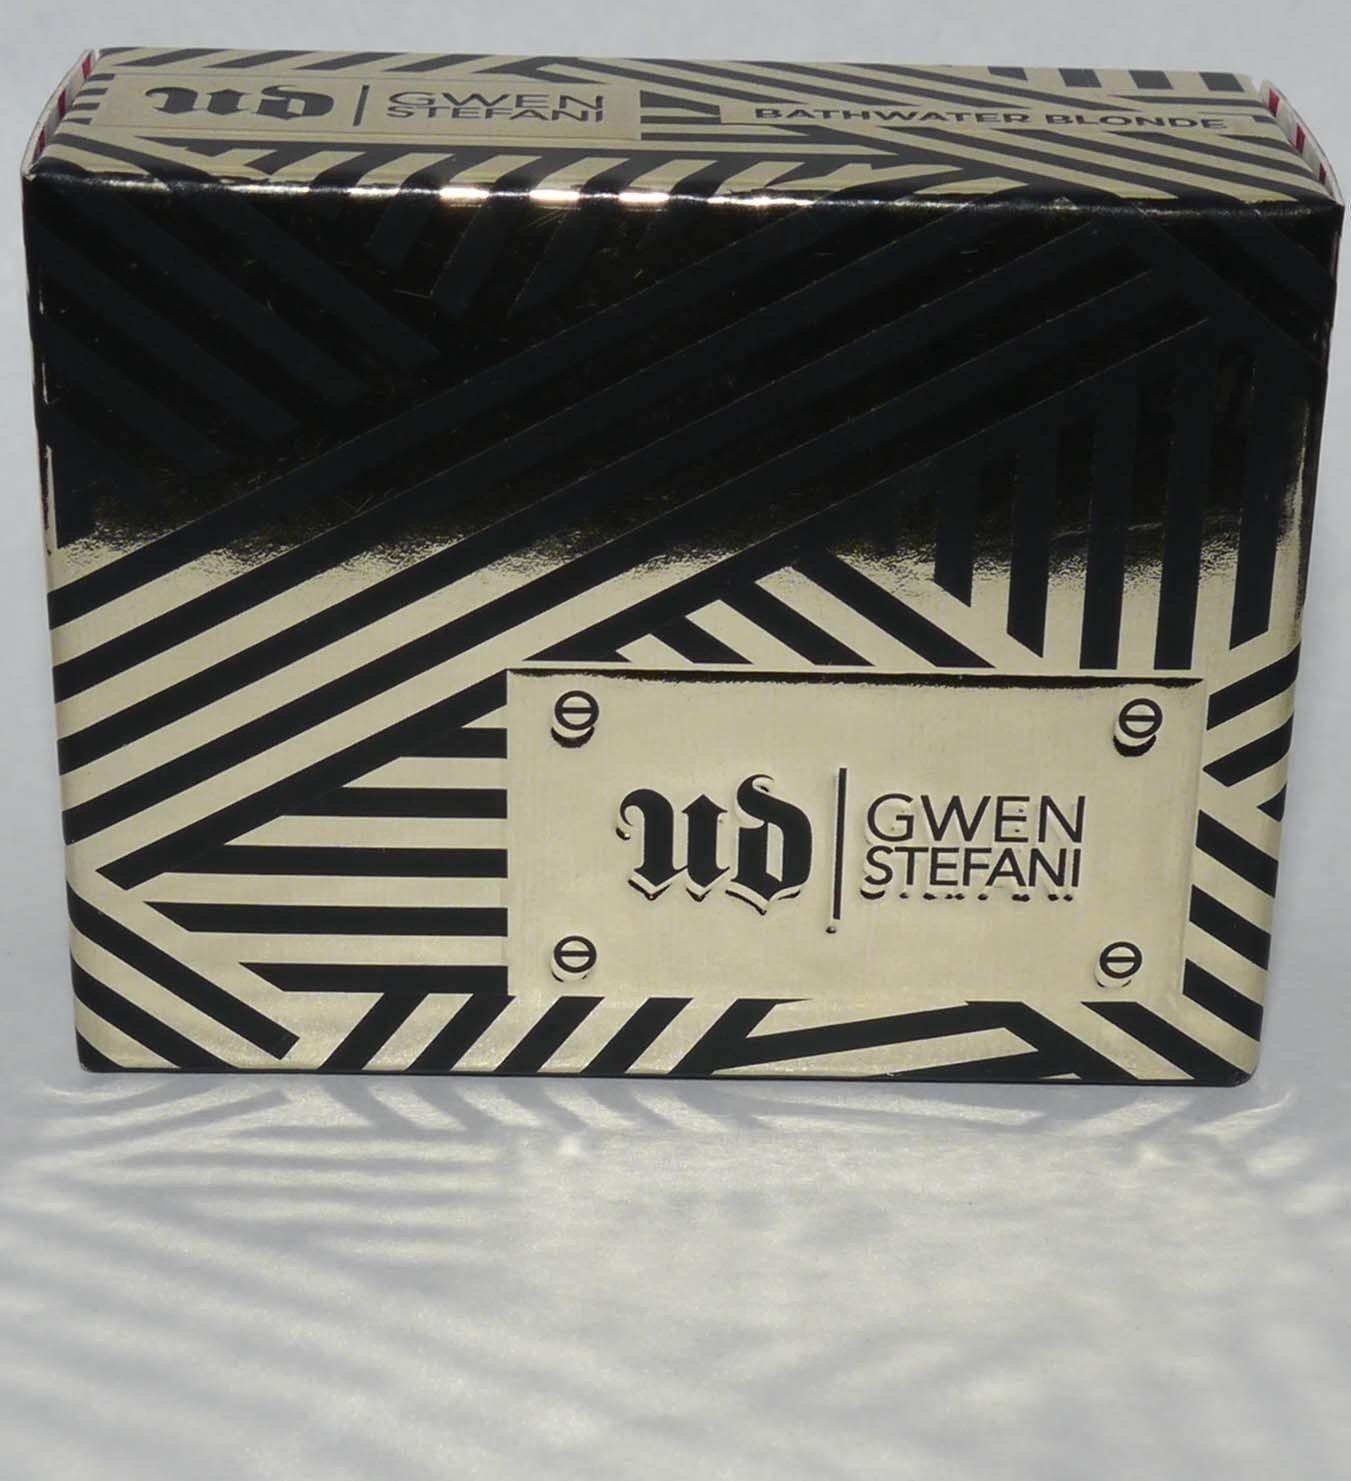 Urban Decay UD Gwen Stefani Brow Box Kit - Bathwater Blonde 2 x 0.04 oz